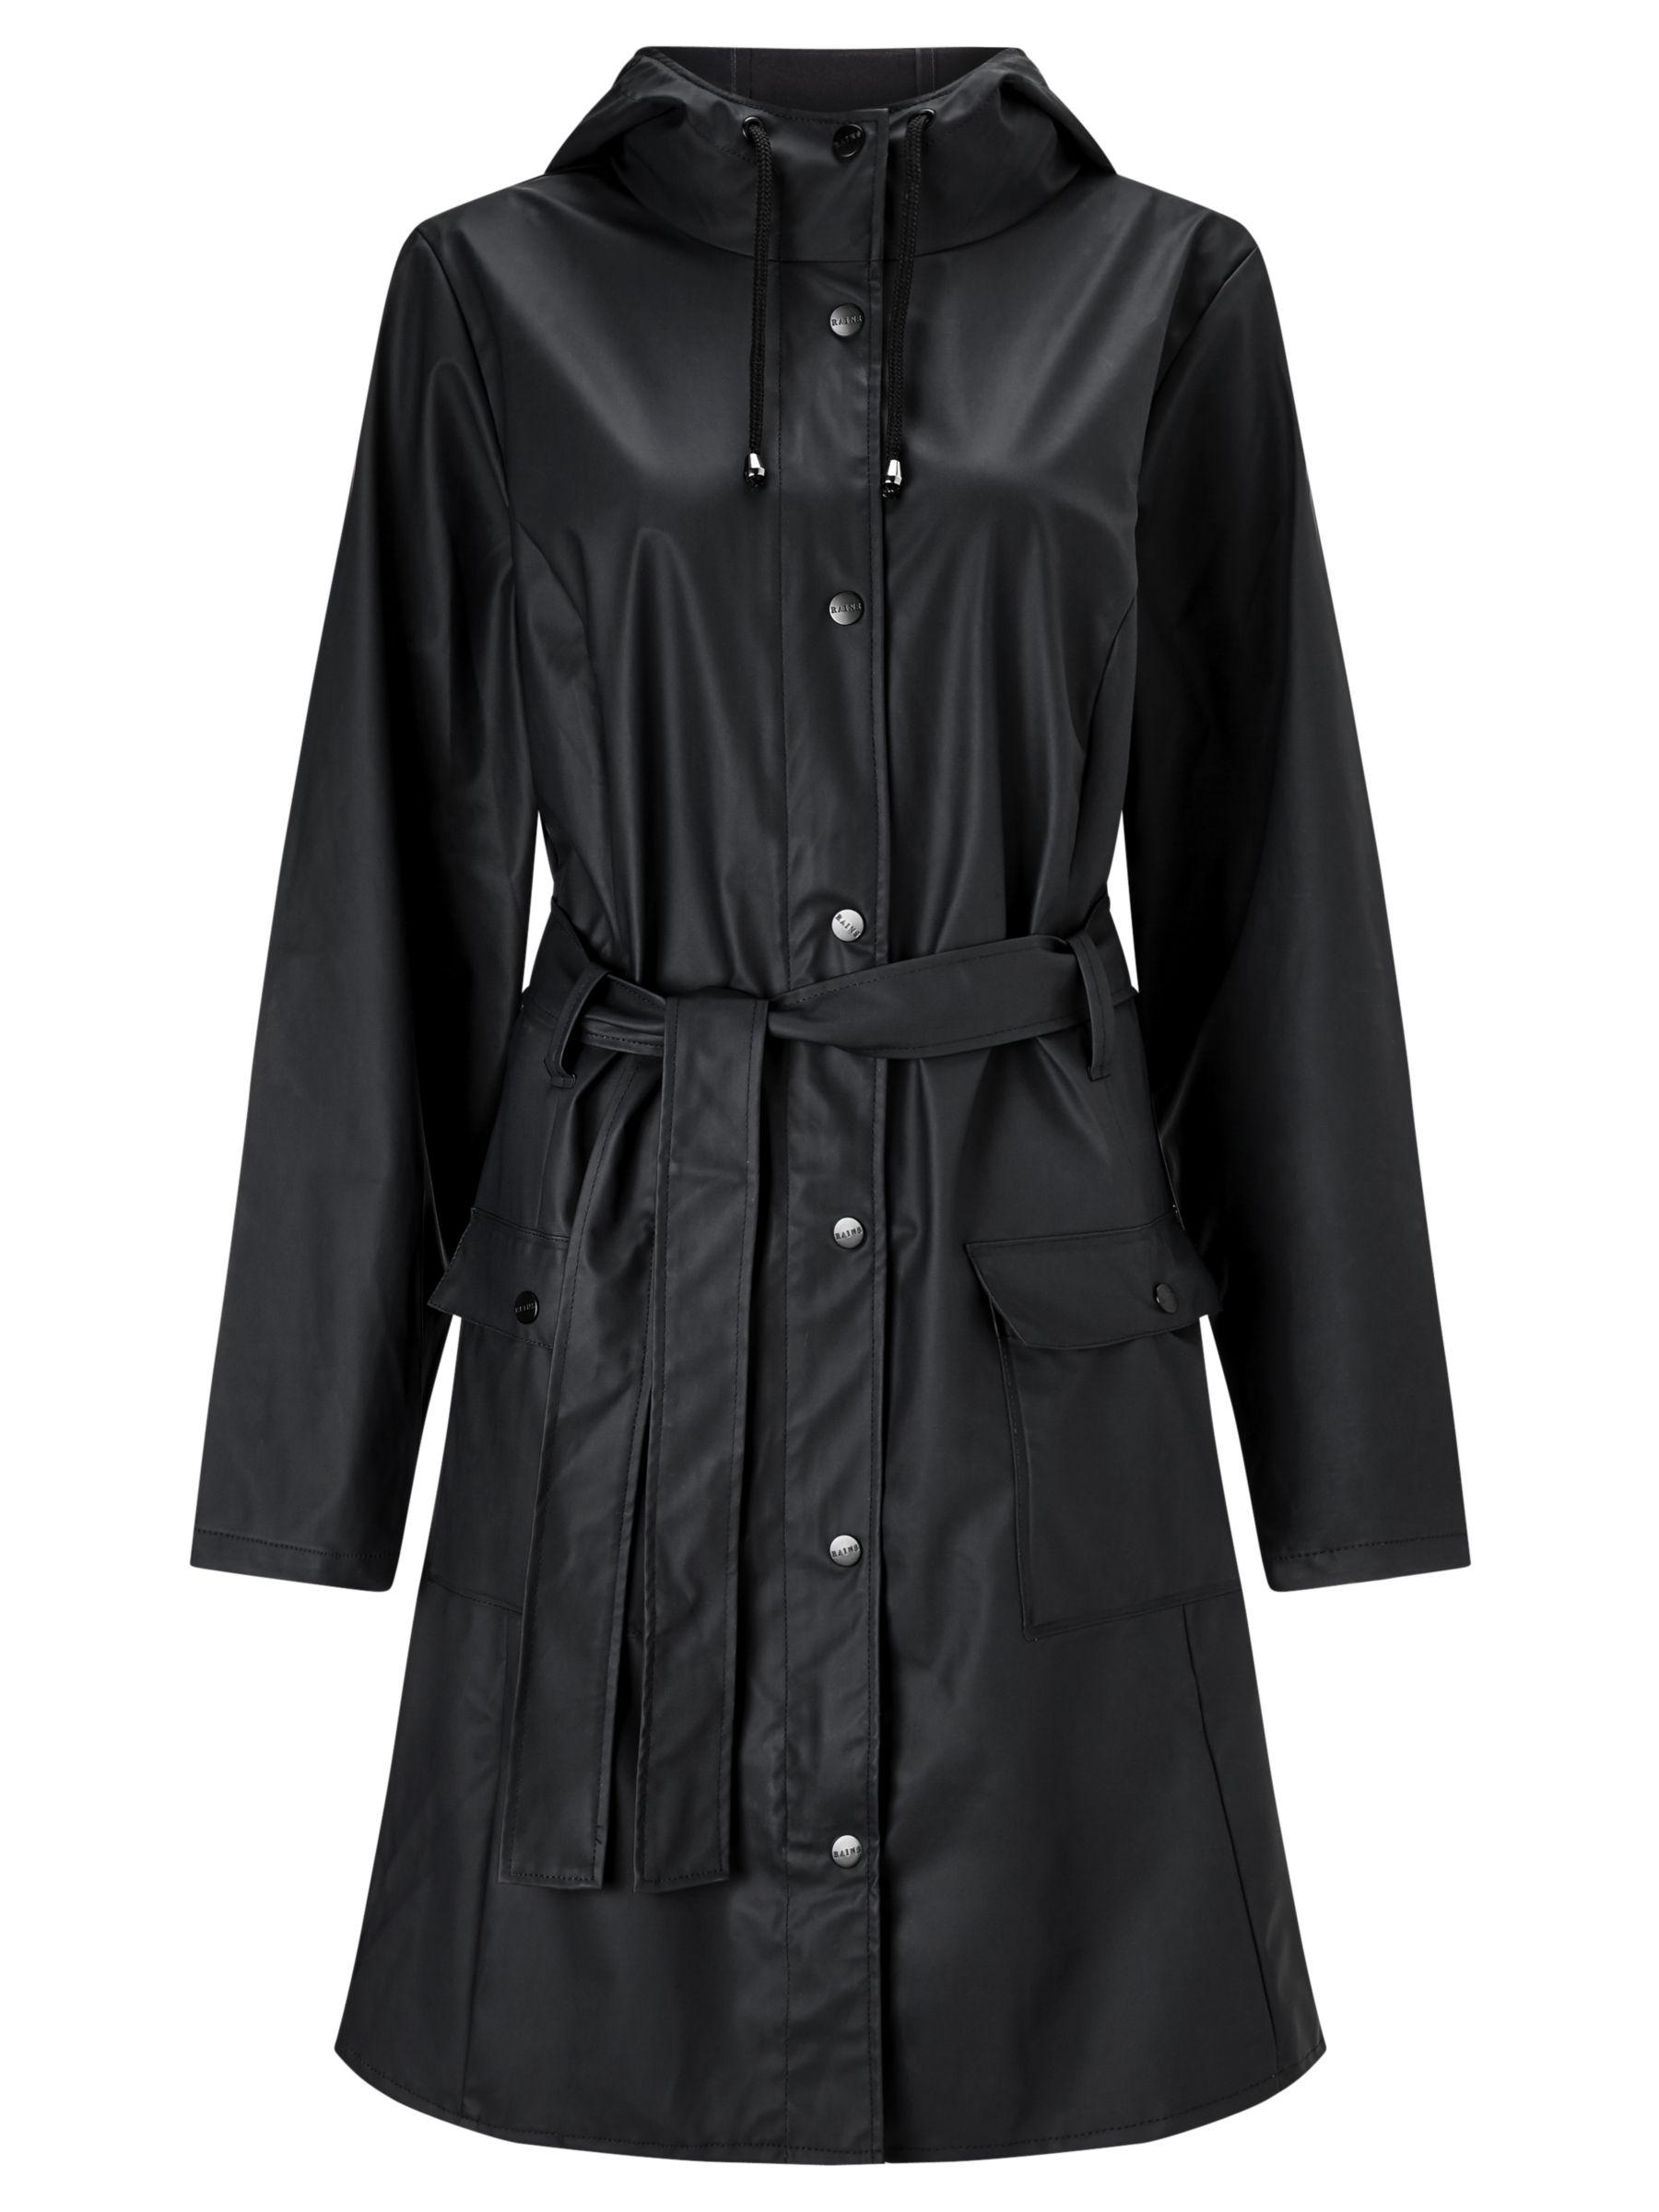 Rains Rains Curve Waterproof Jacket